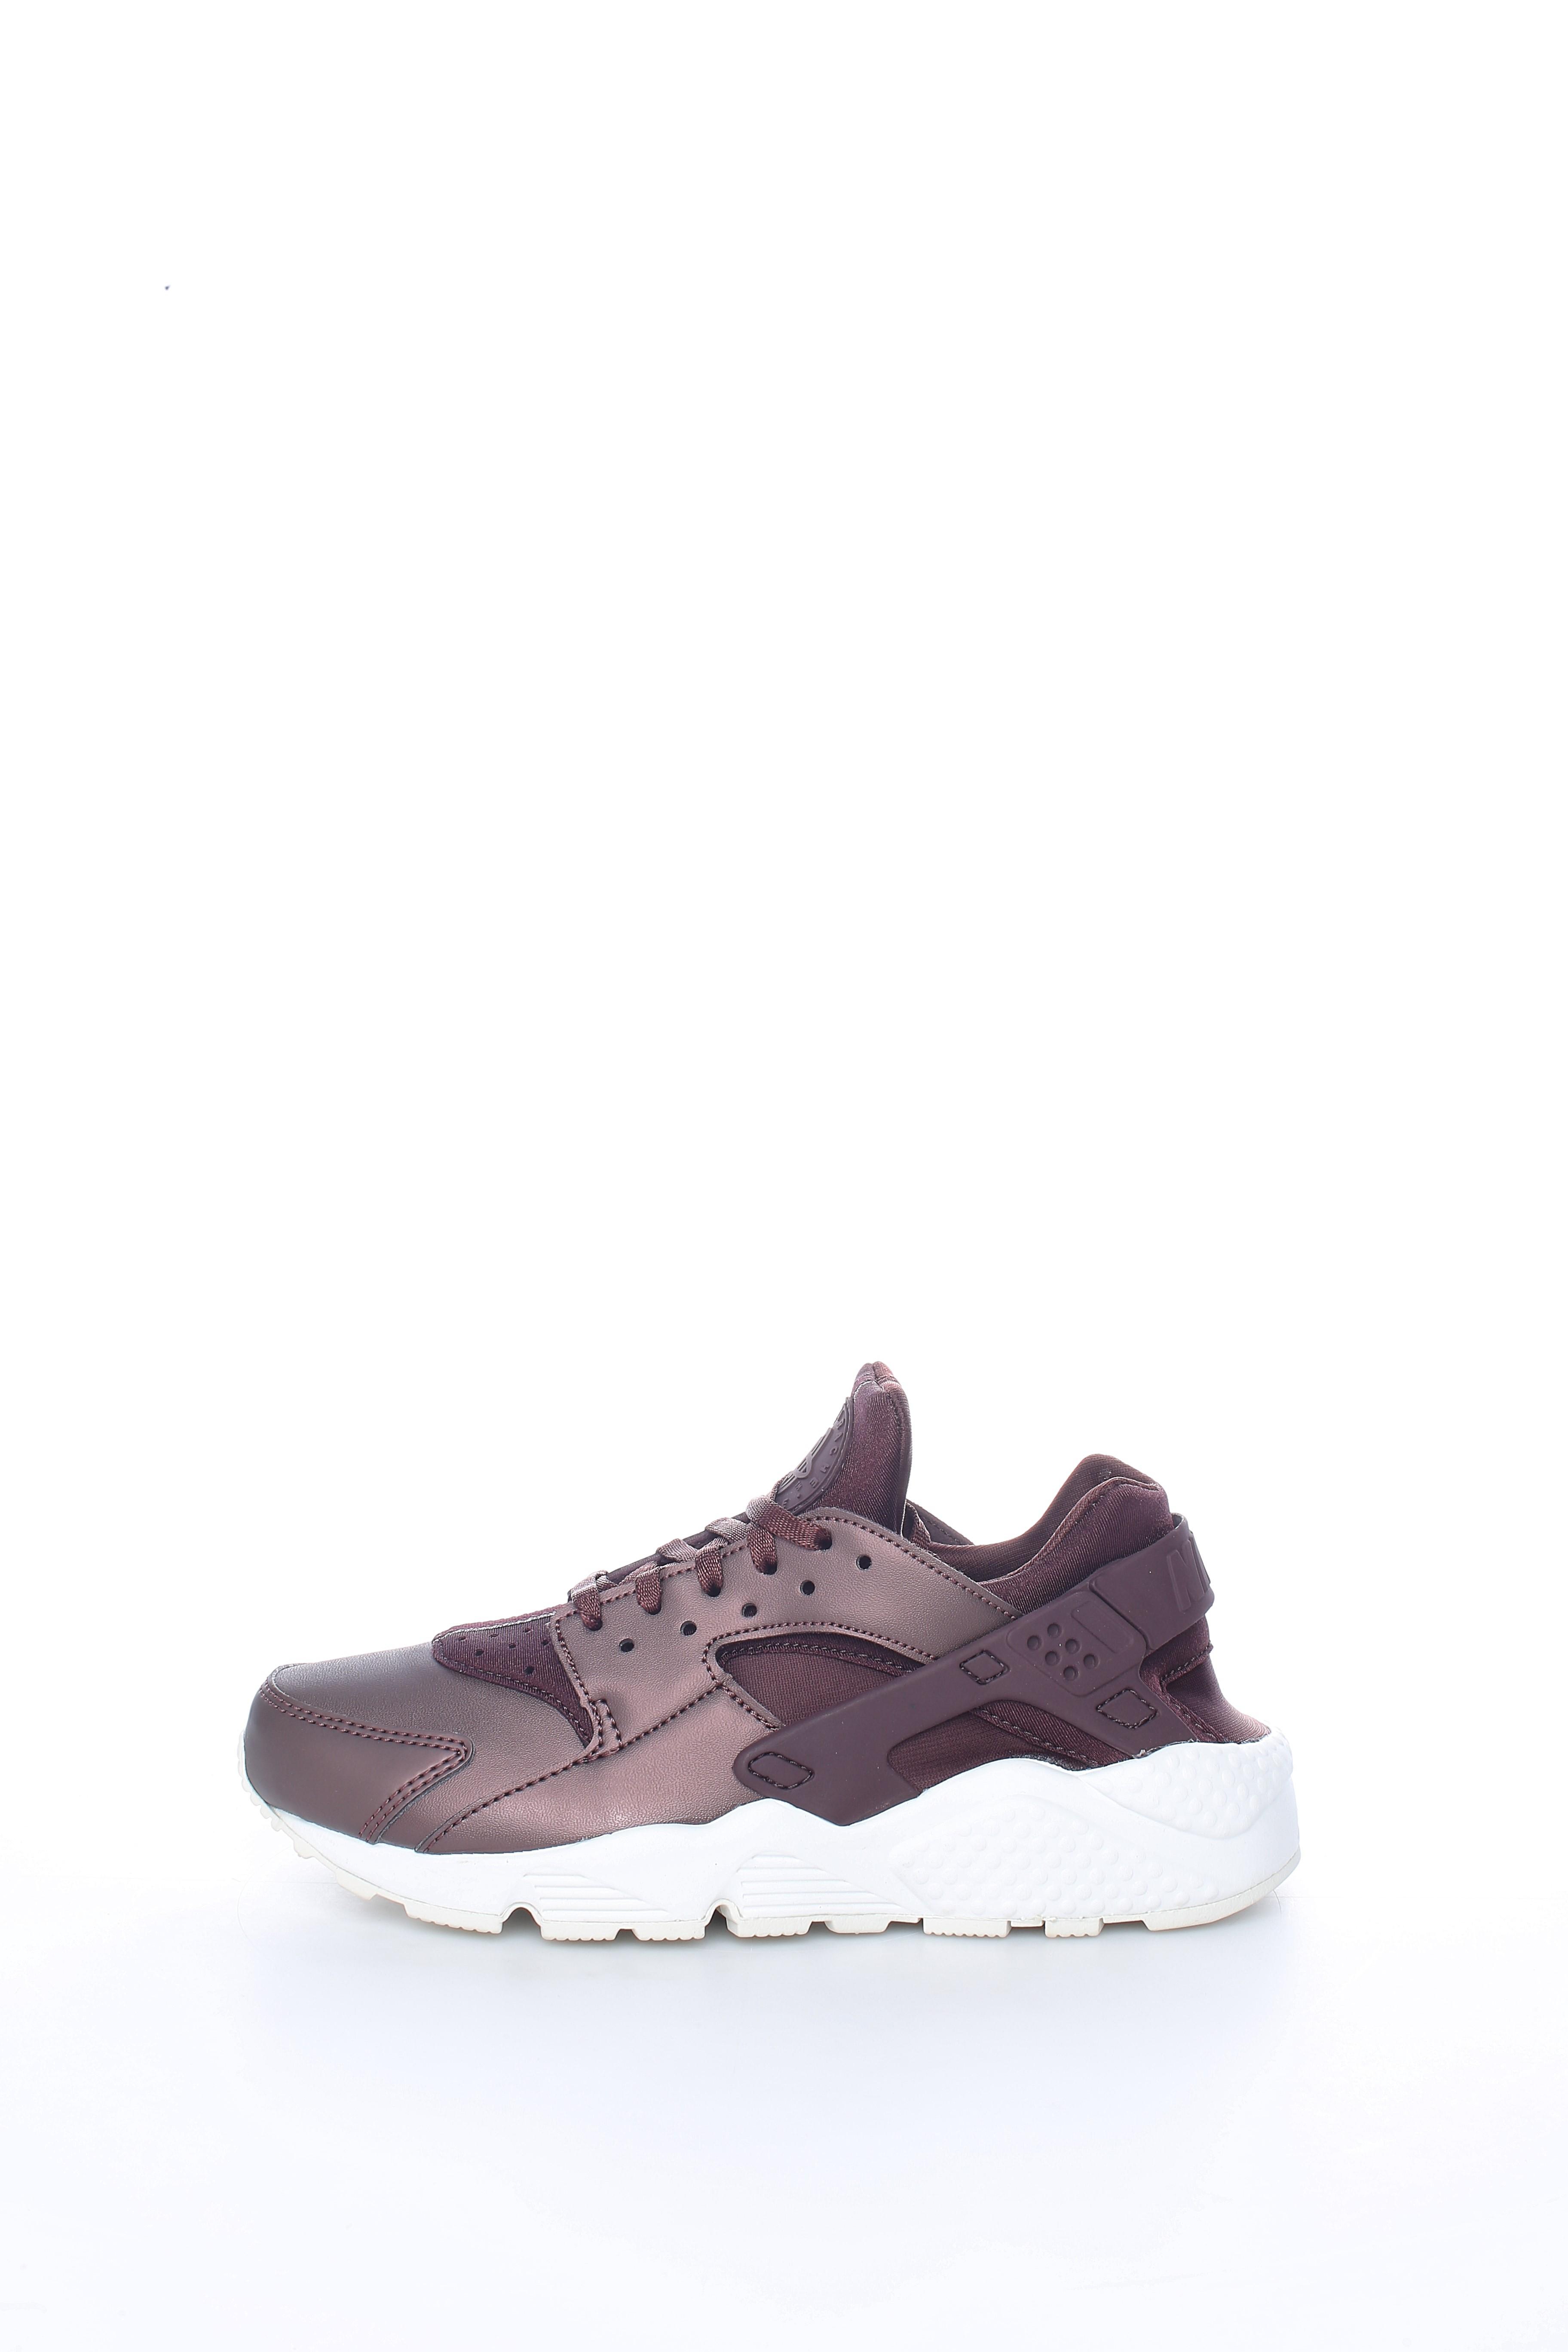 NIKE – Γυναικεία παπούτσια AIR HUARACHE RUN PRM μπορντό